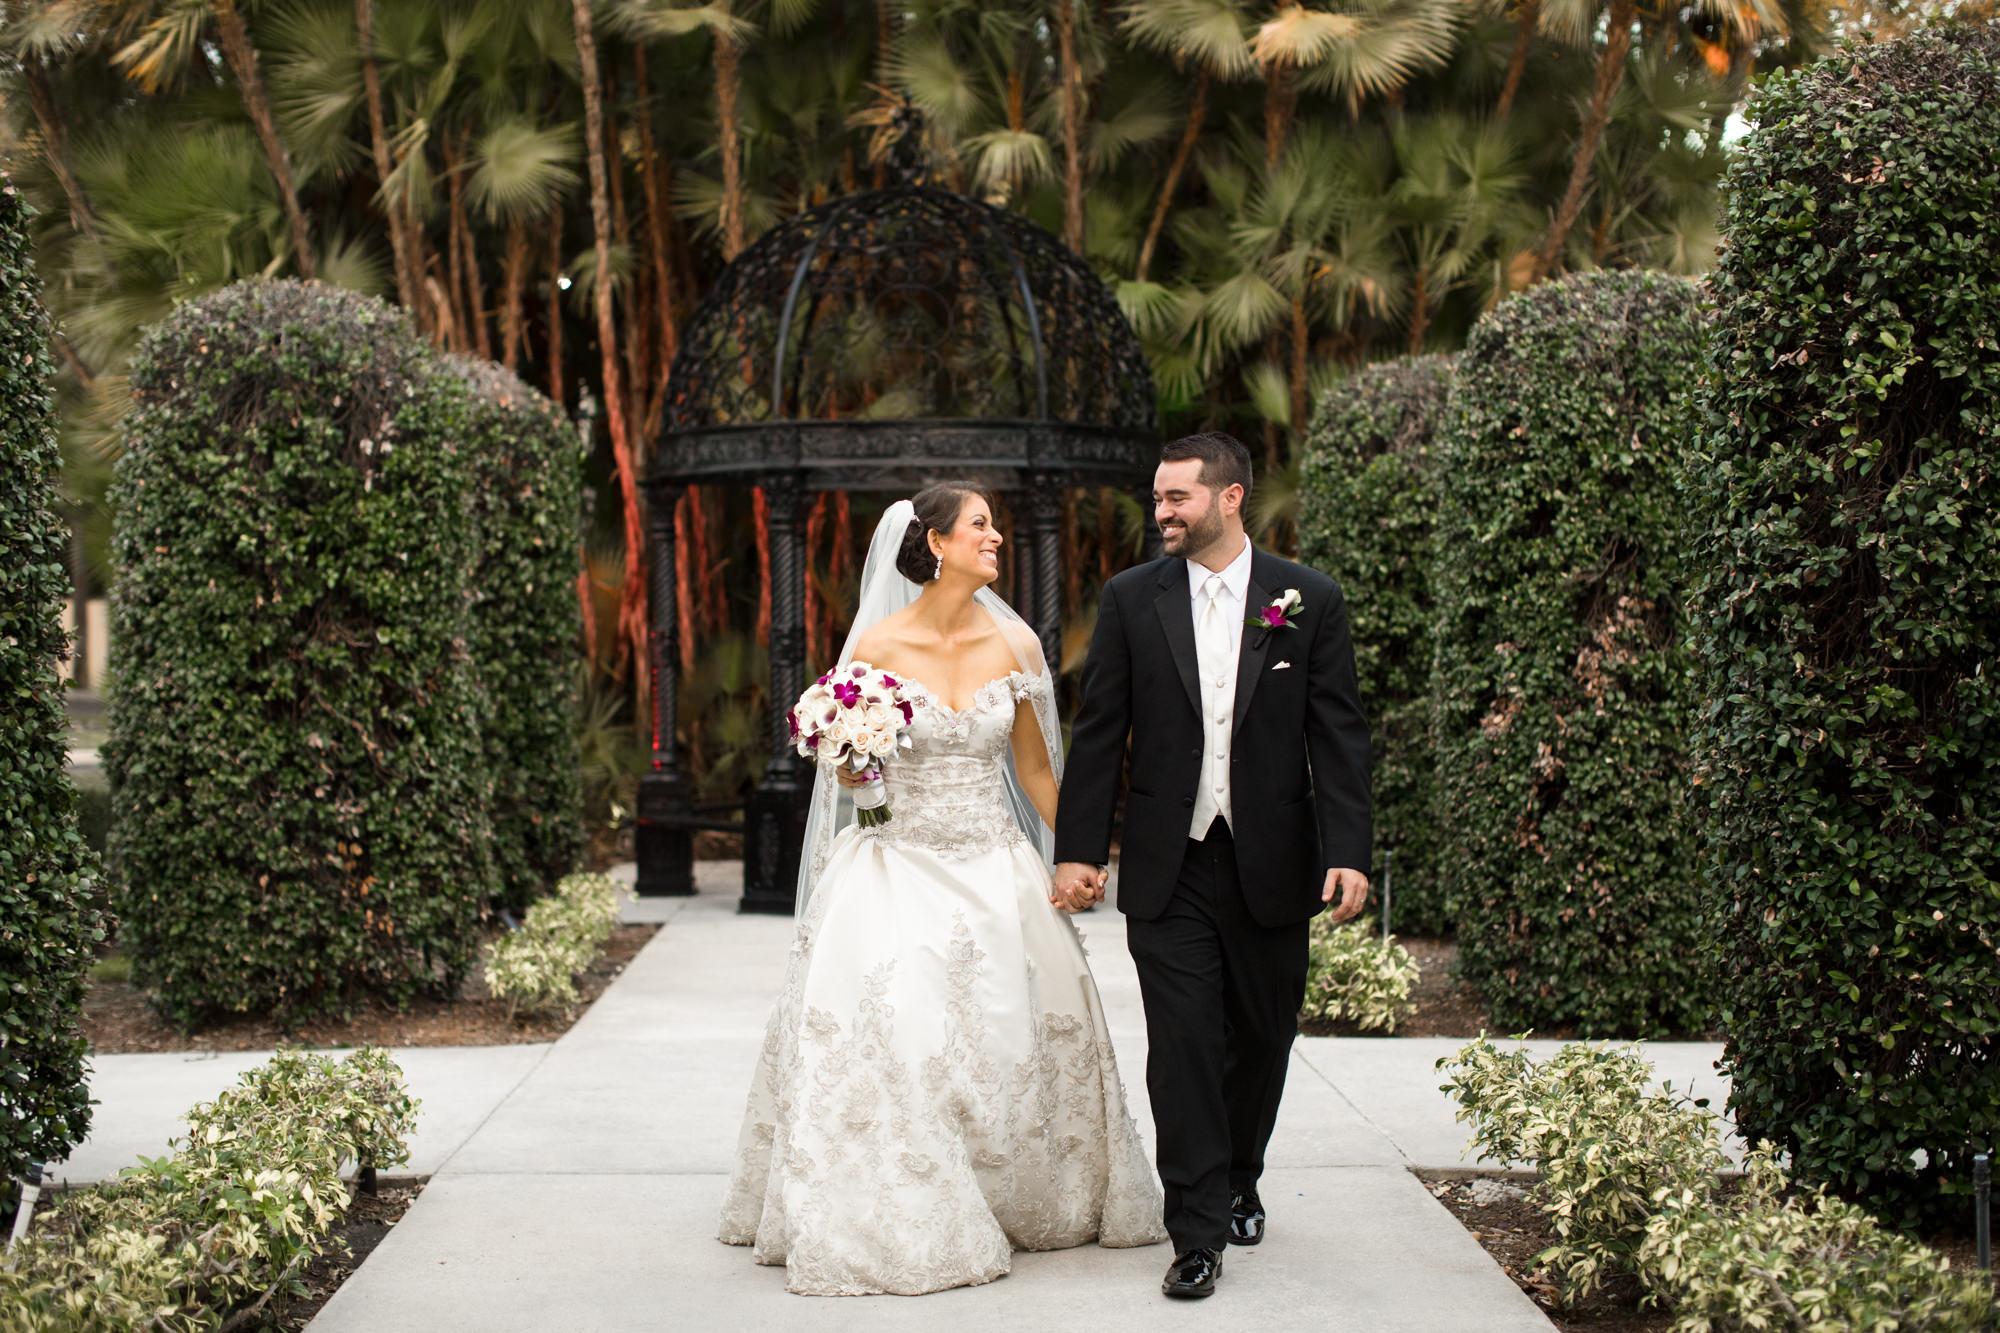 Benvenuto_Wedding_catholic_Florida_Bride-Groom-70.jpg